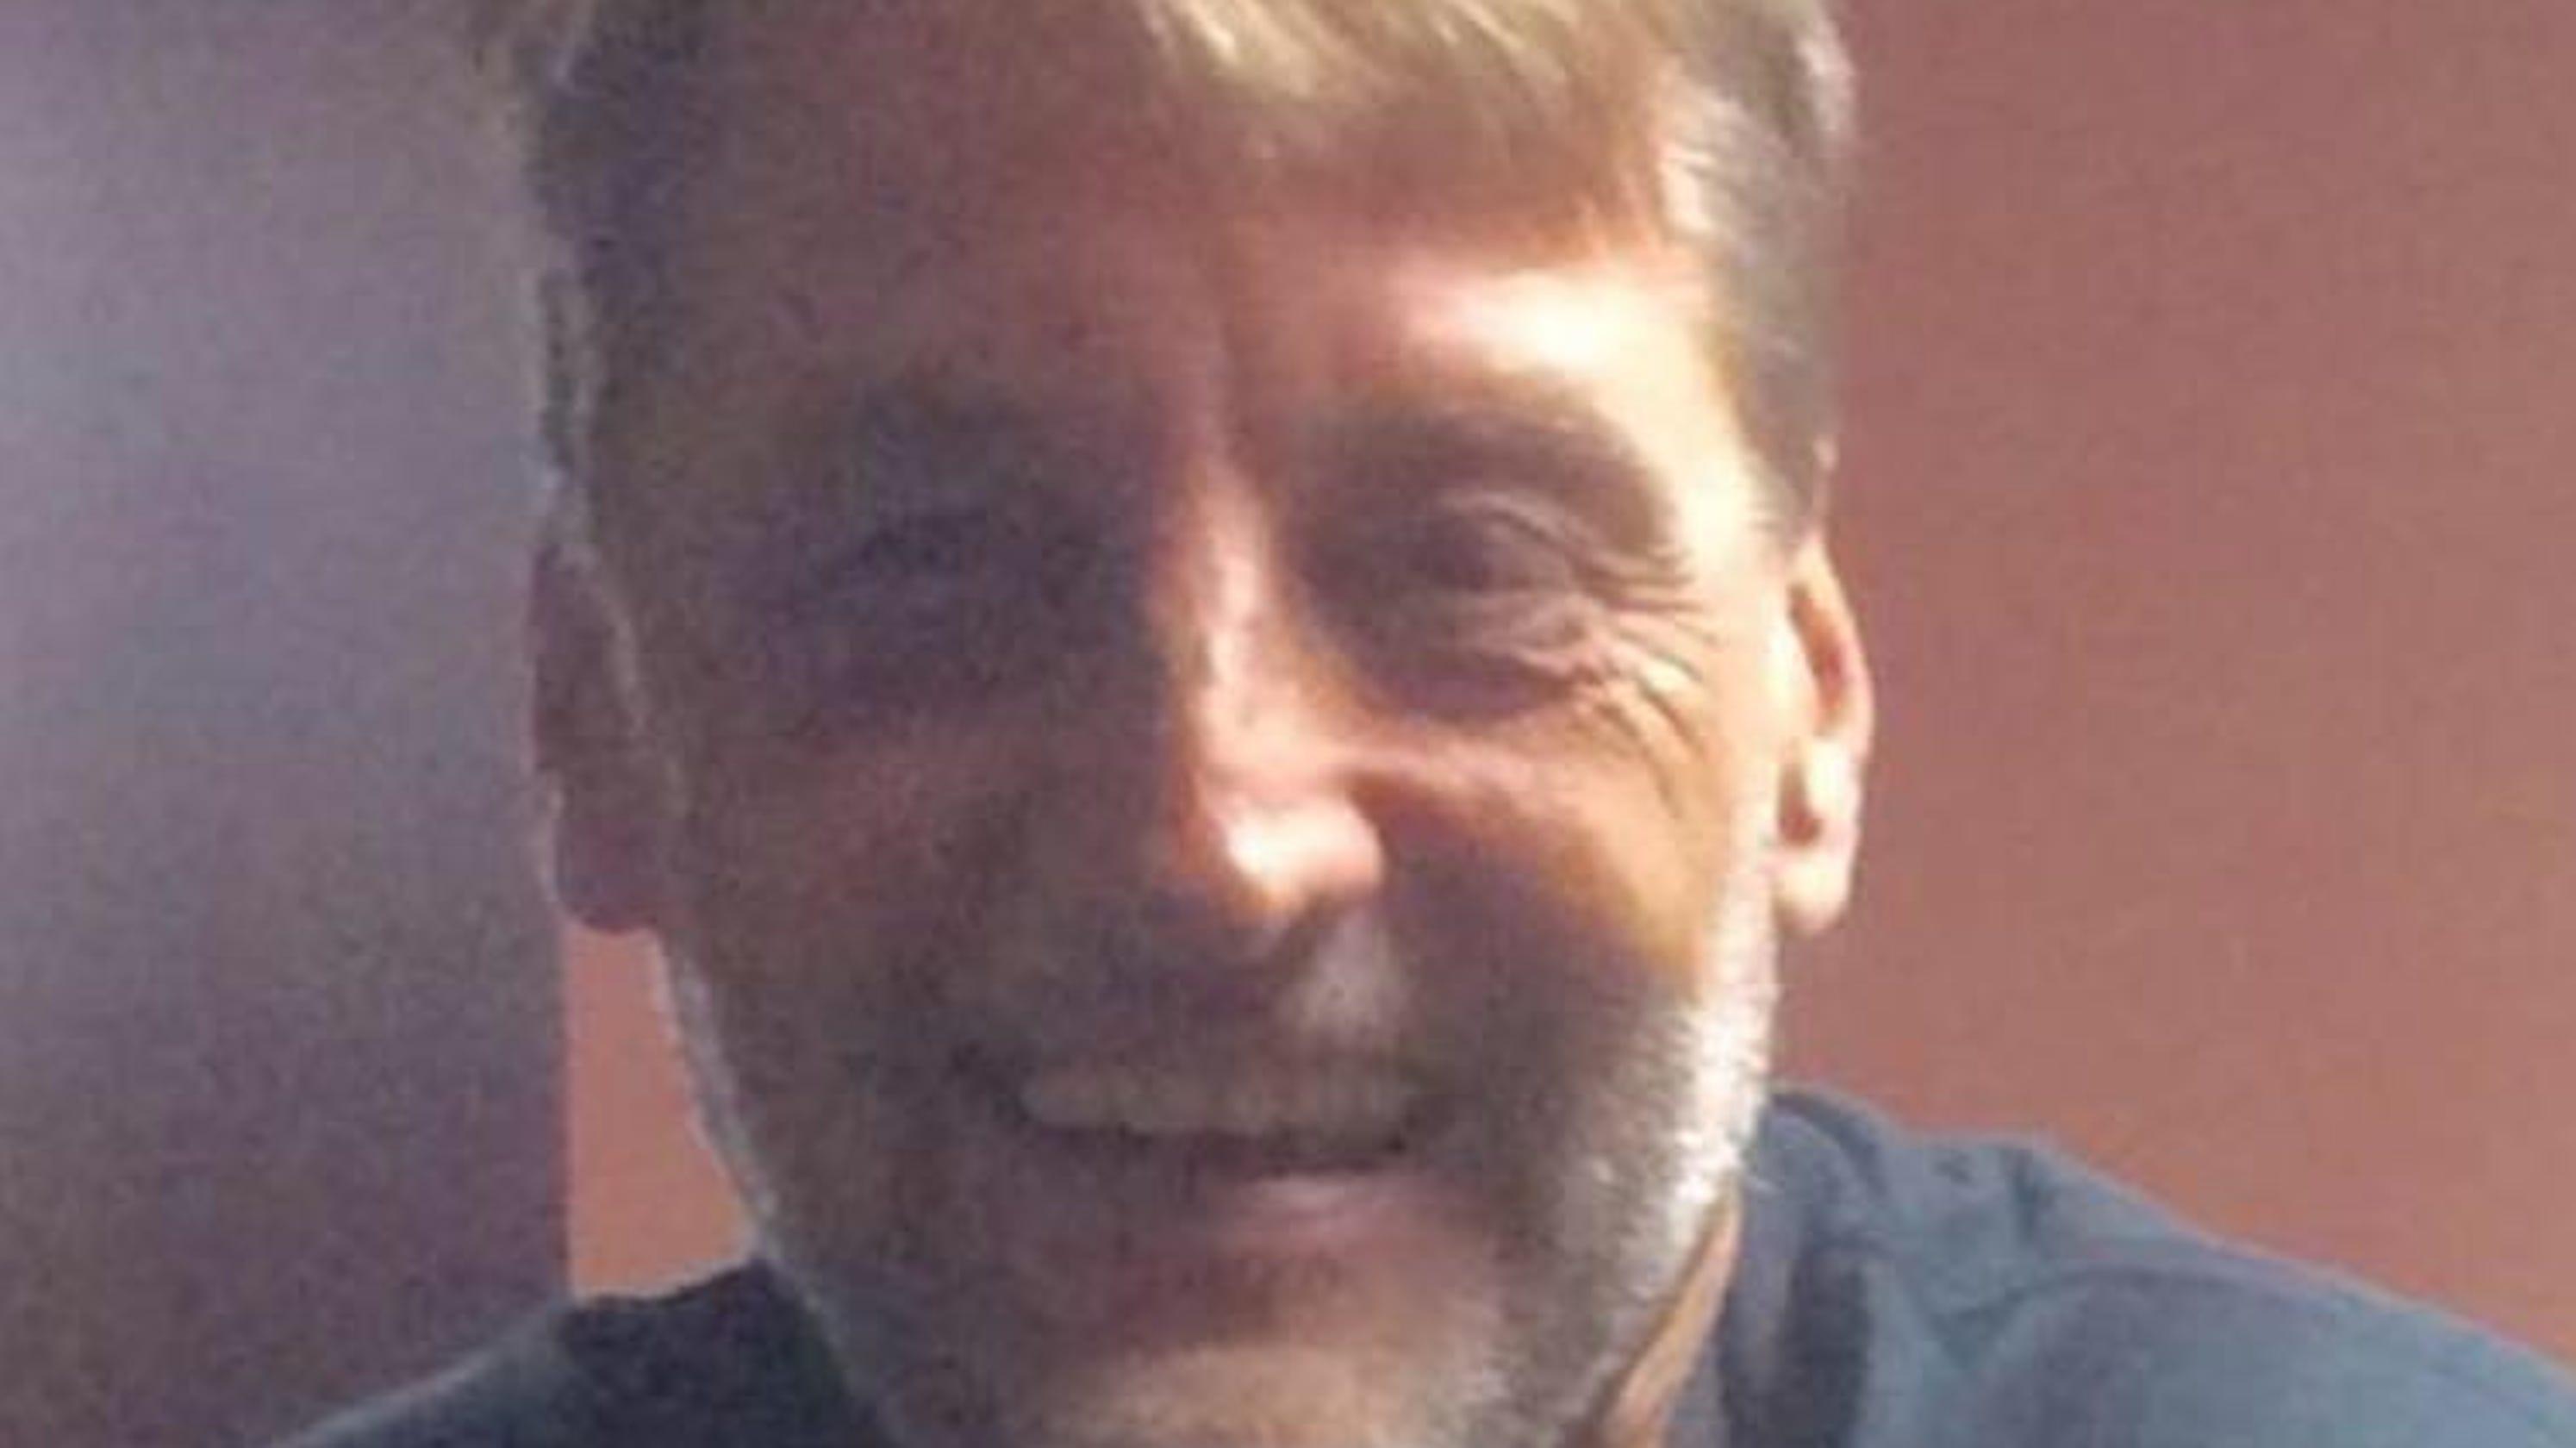 Waukesha County Social Worker Bernard Trokan Indicted For